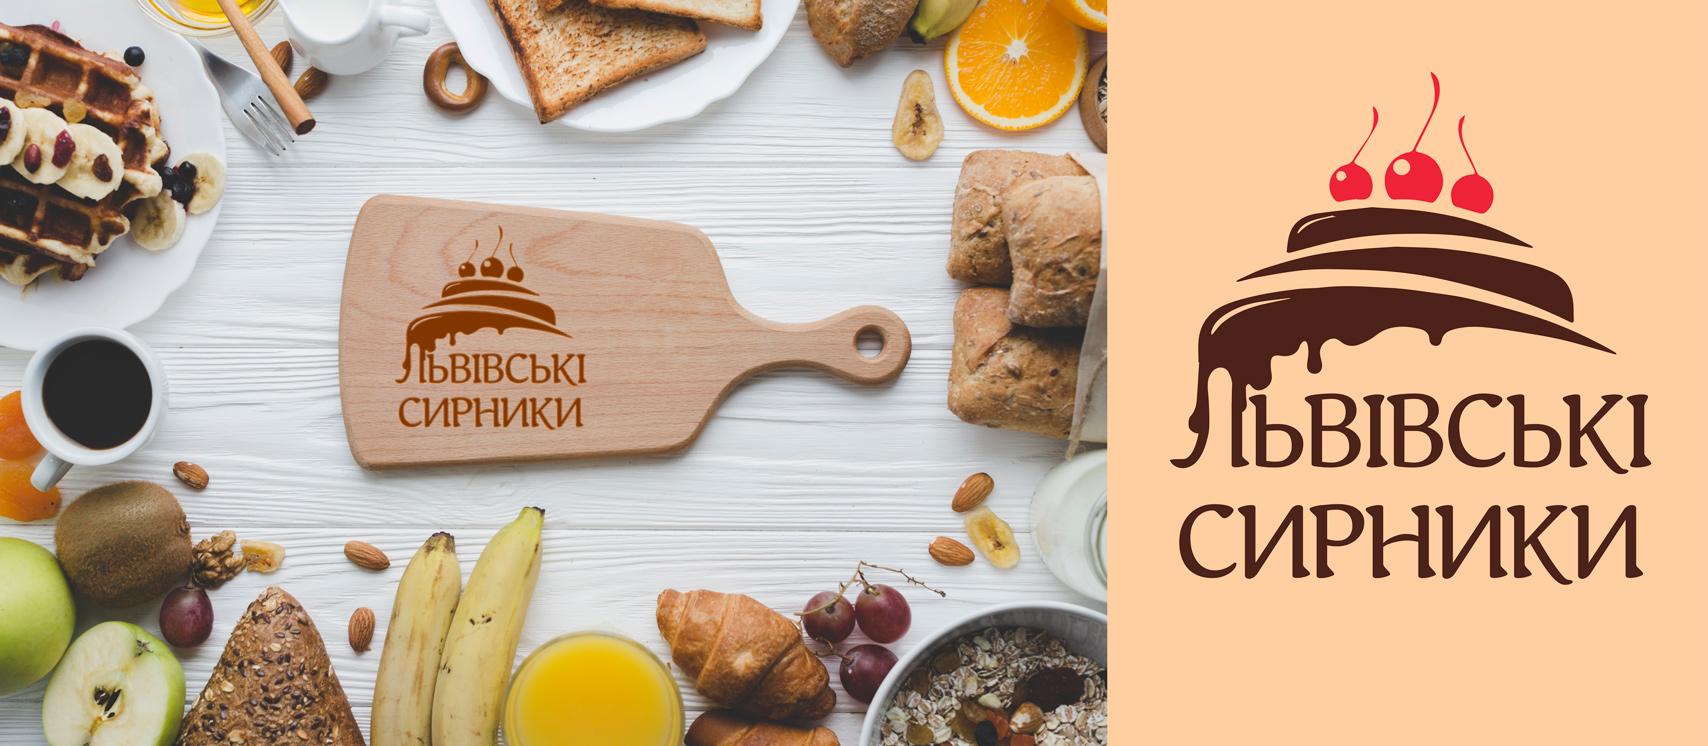 Фото Логотип пекарни